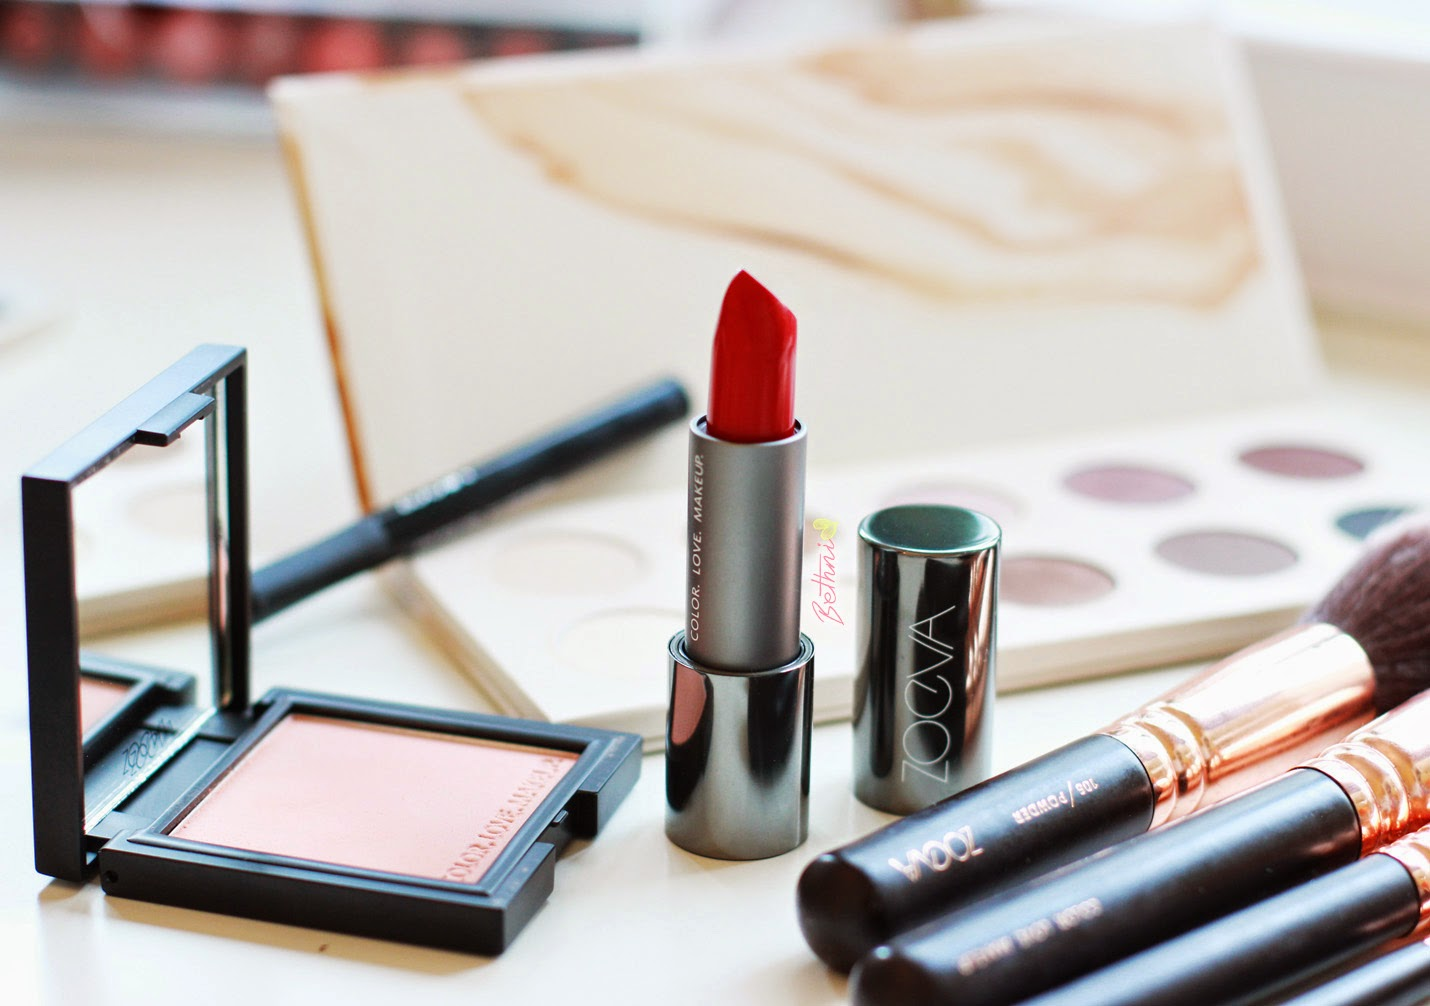 Zoeva Luxe Cream Lipstick - Cooling Passion